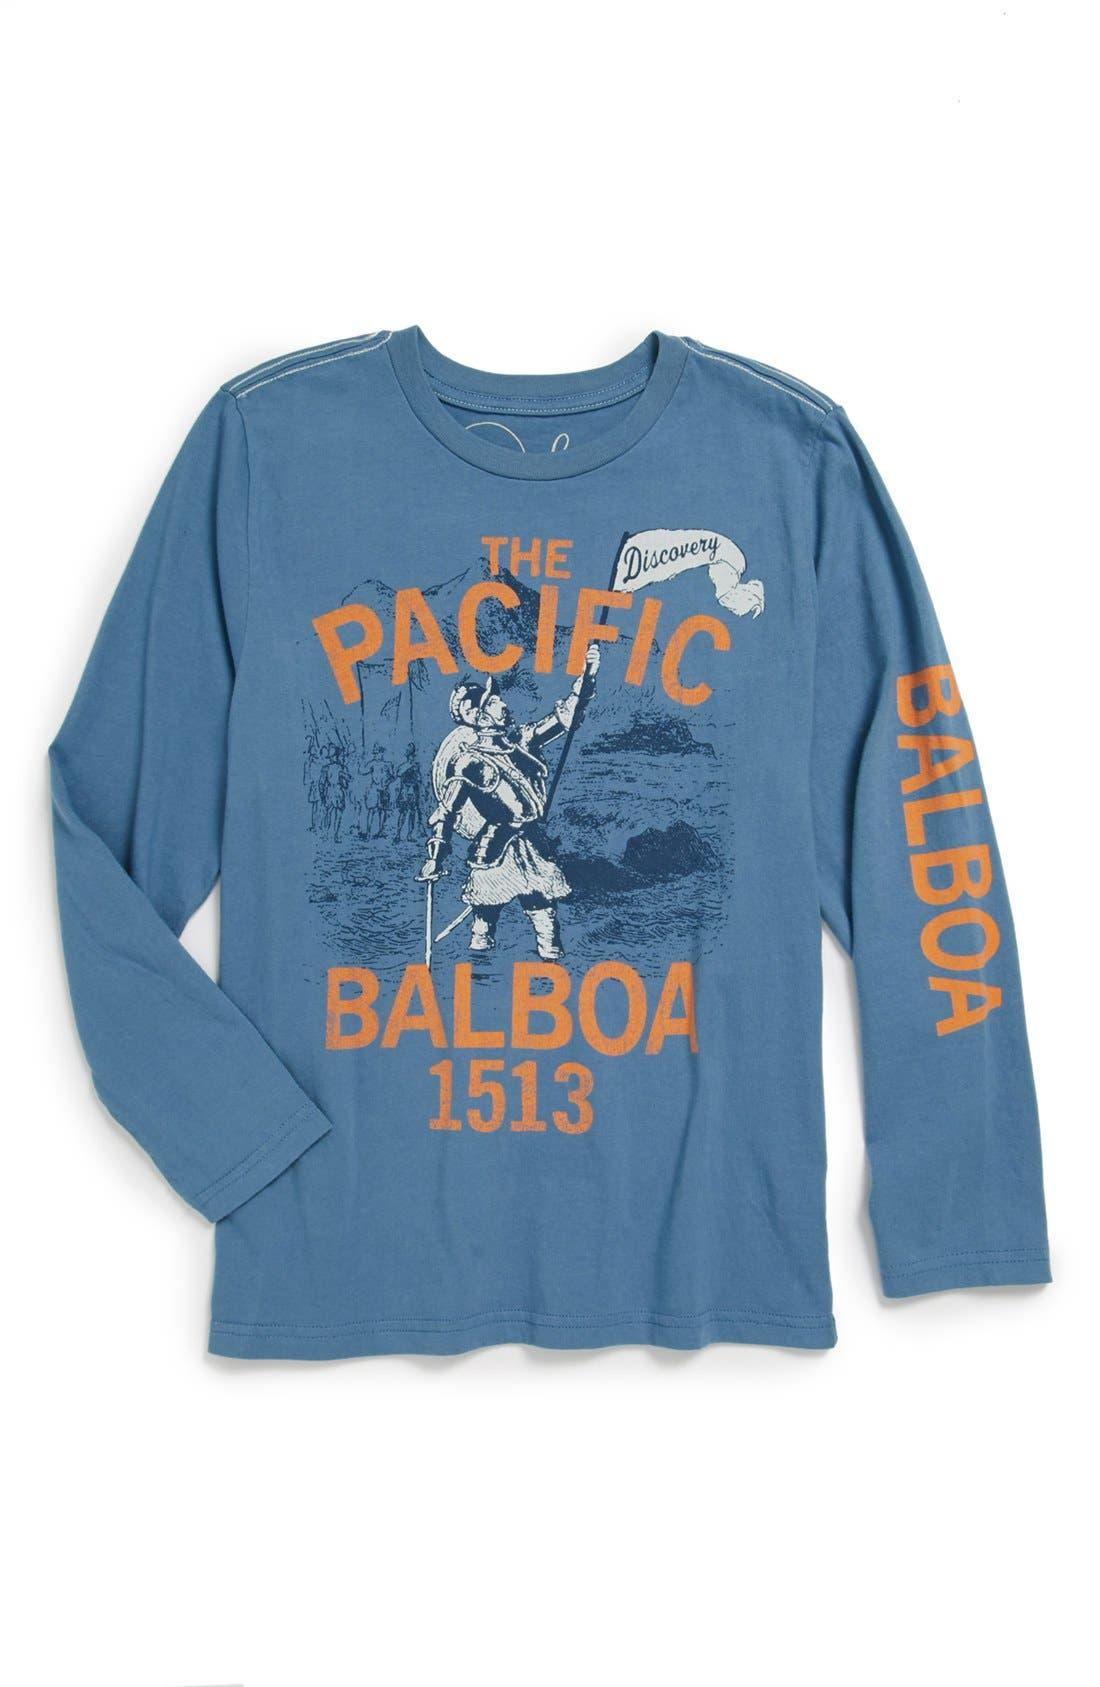 Alternate Image 1 Selected - Peek 'Balboa' Long Sleeve T-Shirt (Toddler Boys, Little Boys & Big Boys)